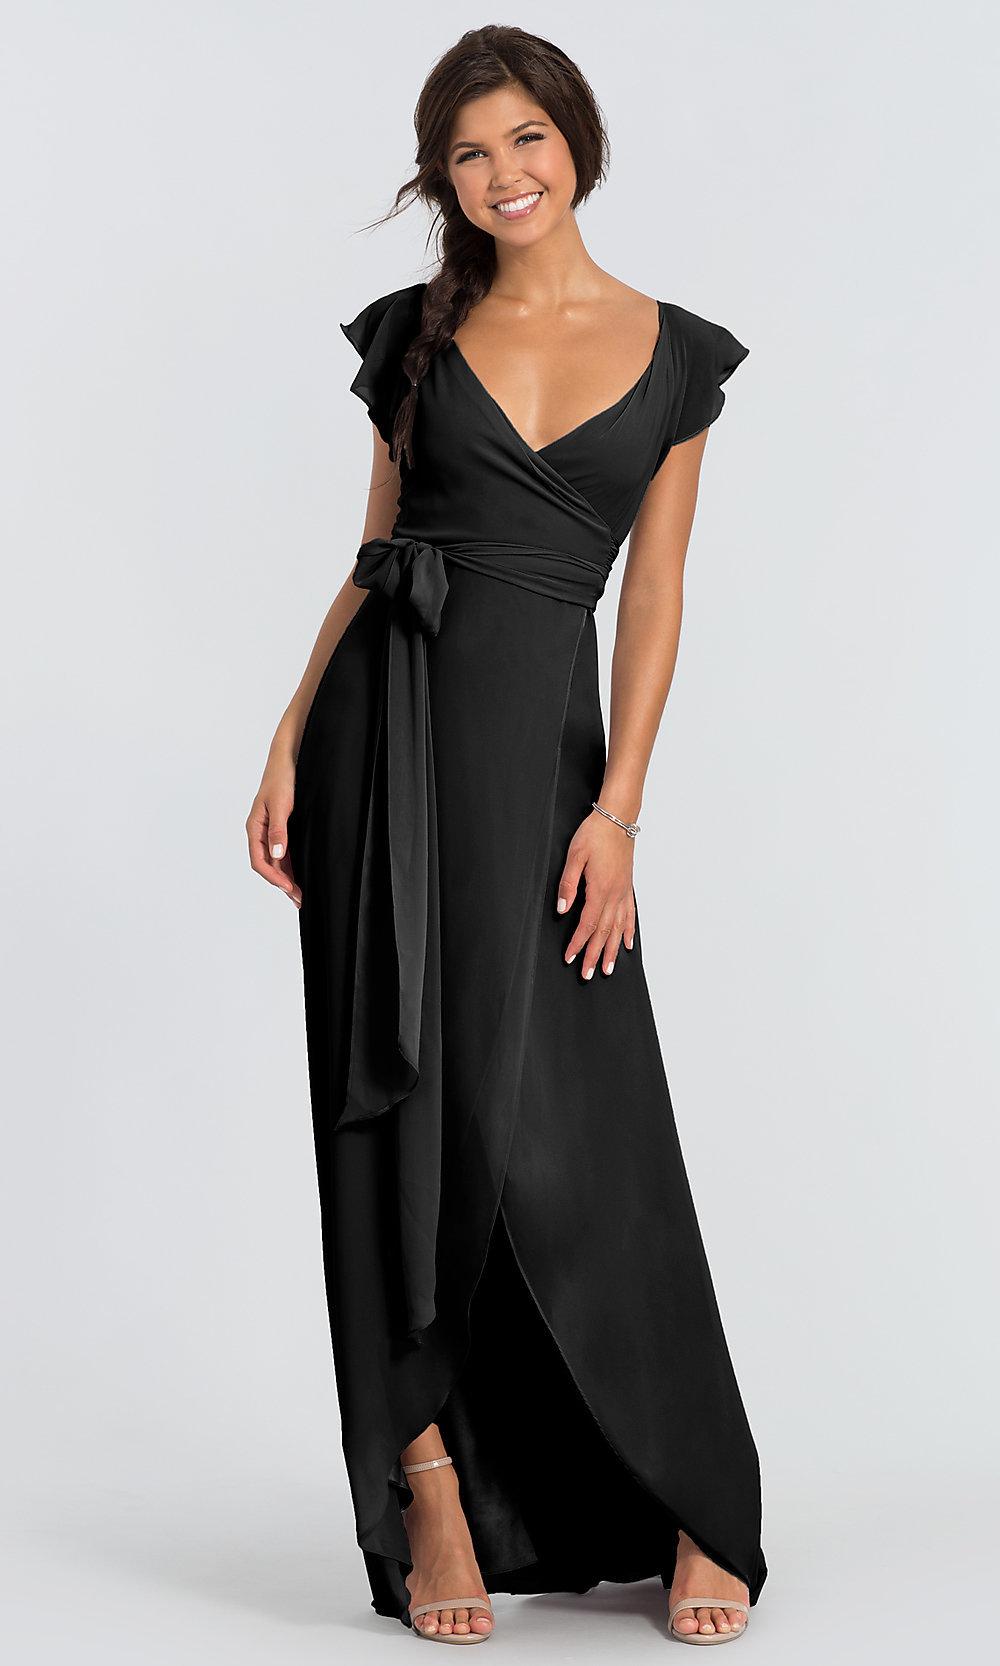 Sleeved dorian long black prom dress